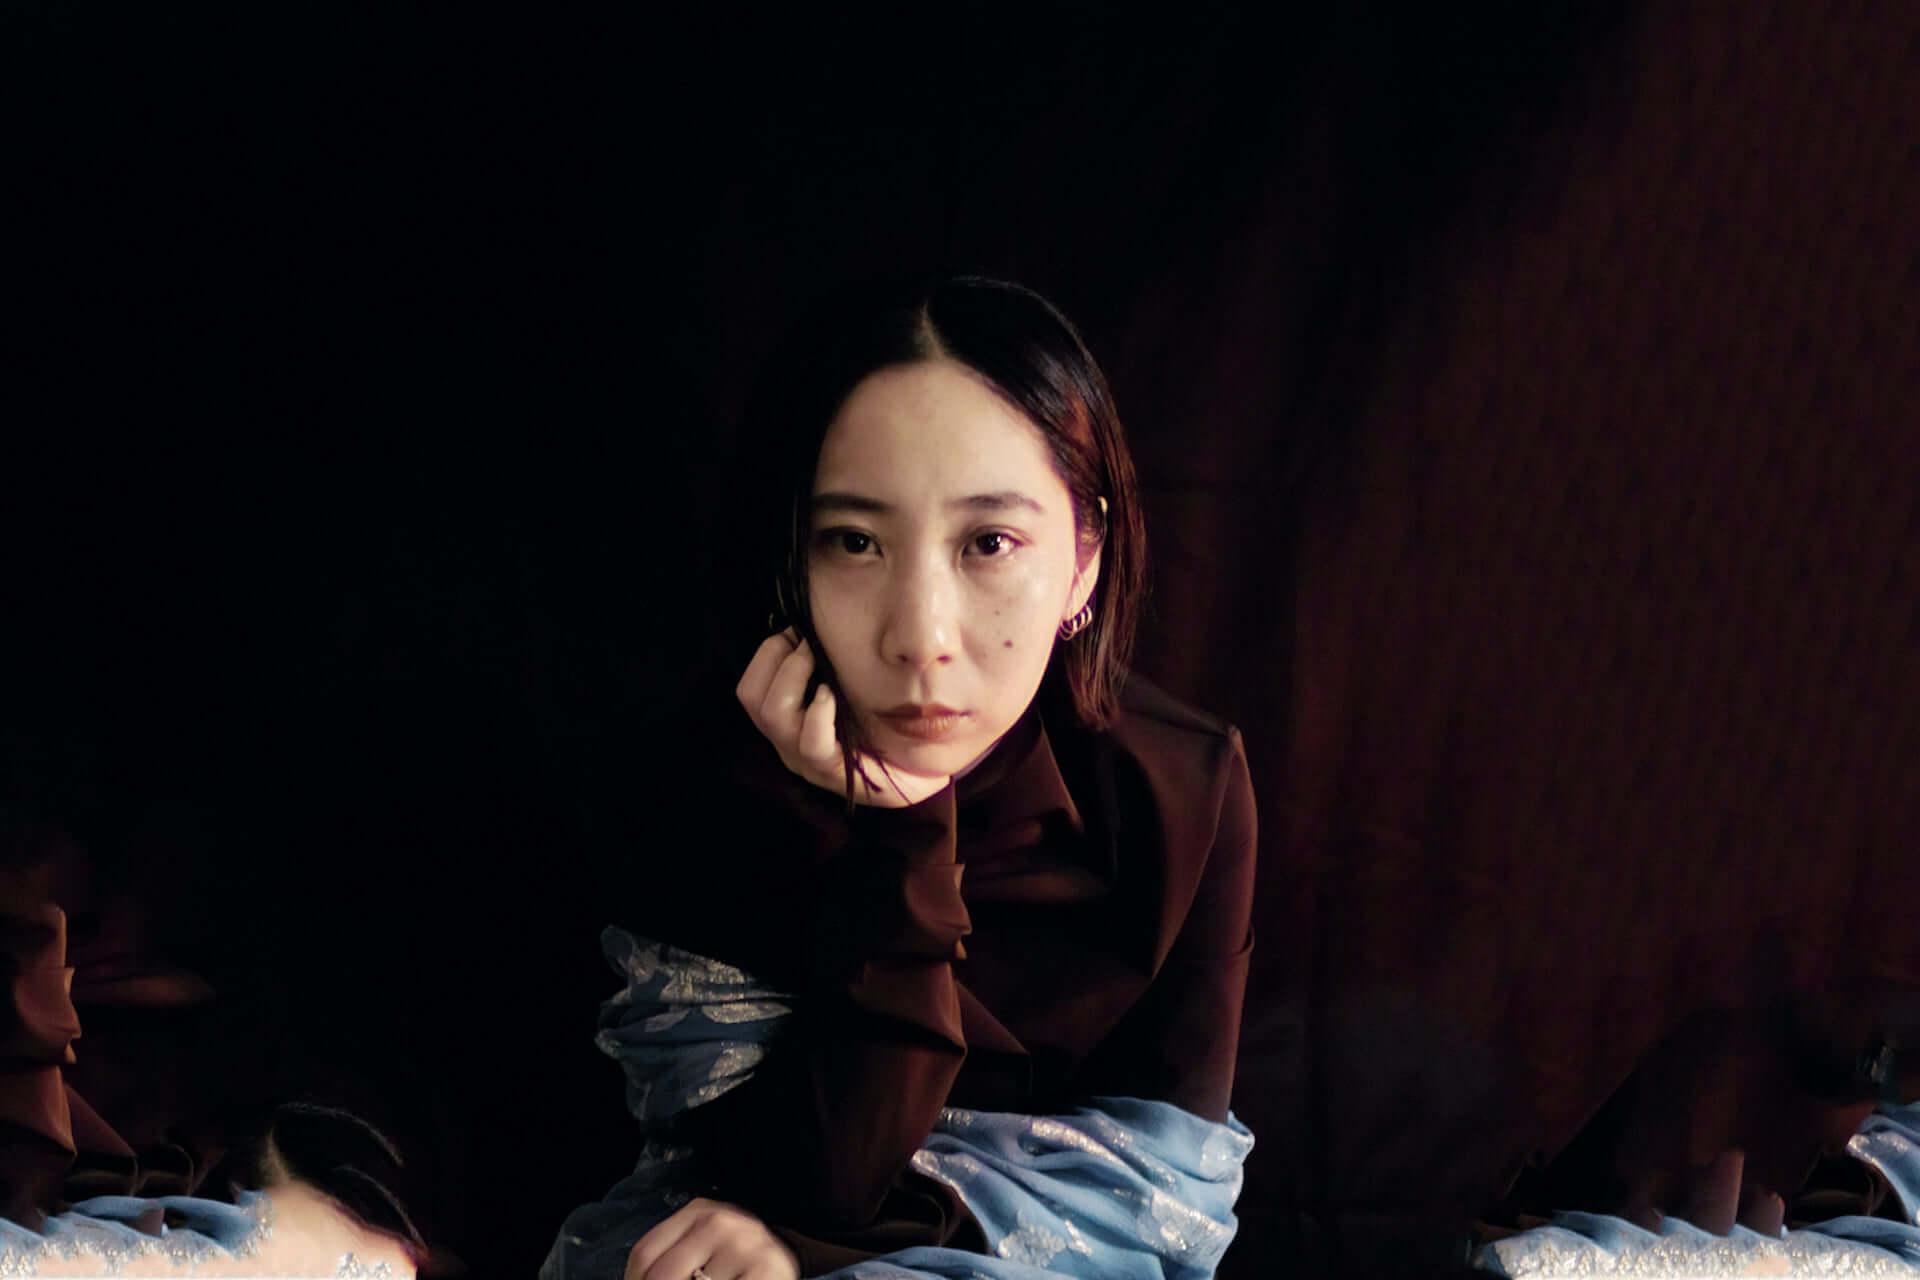 Utena Kobayashi最新作『Darkest Era』が〈BINDIVIDUAL〉より本日リリース!本人コメントも到着 music201120_utenakobayashi_2-1920x1280